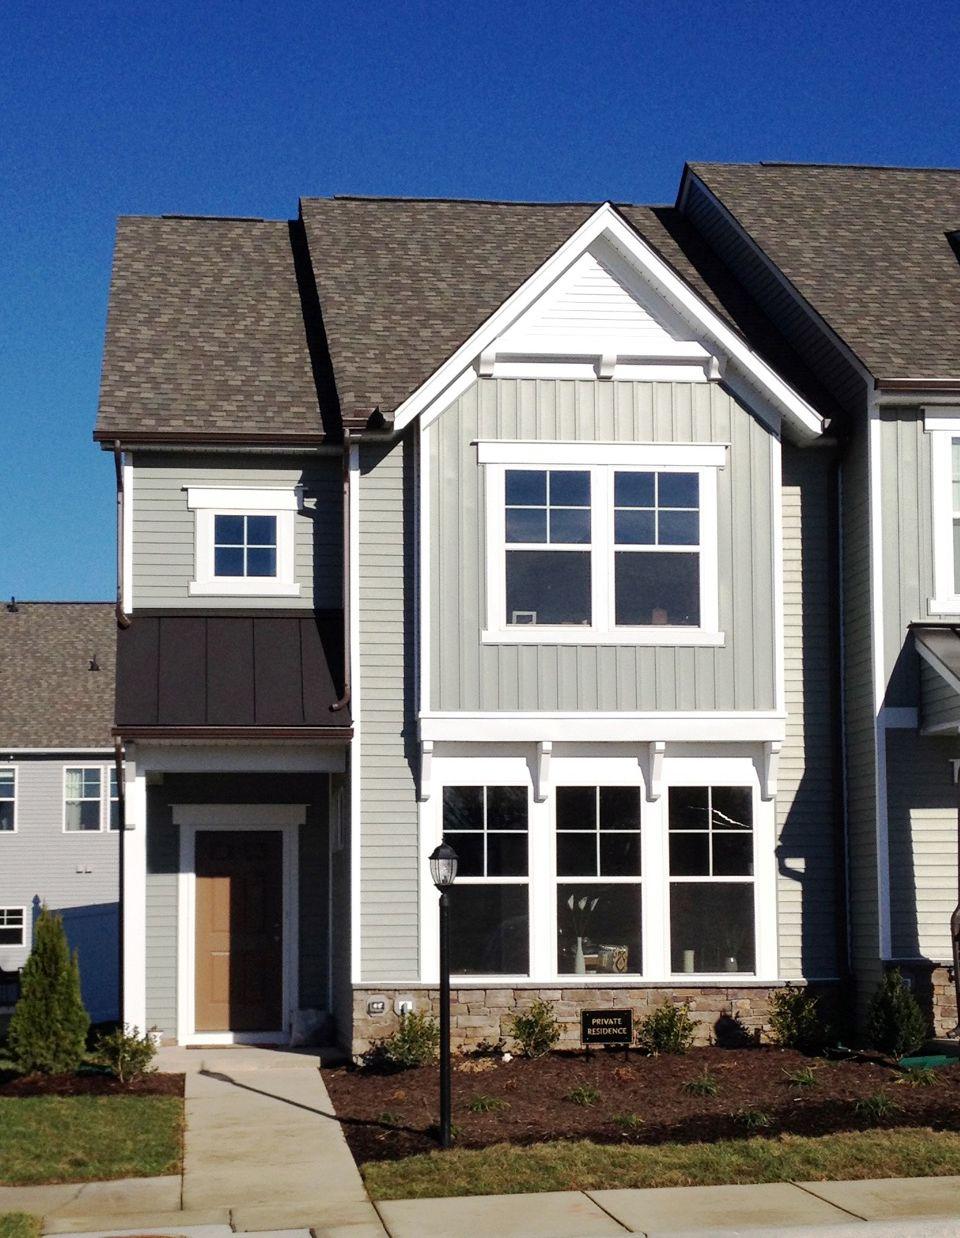 10631 Marions Place, Glen Allen, Short Pump, VA Homes & Land - Real Estate